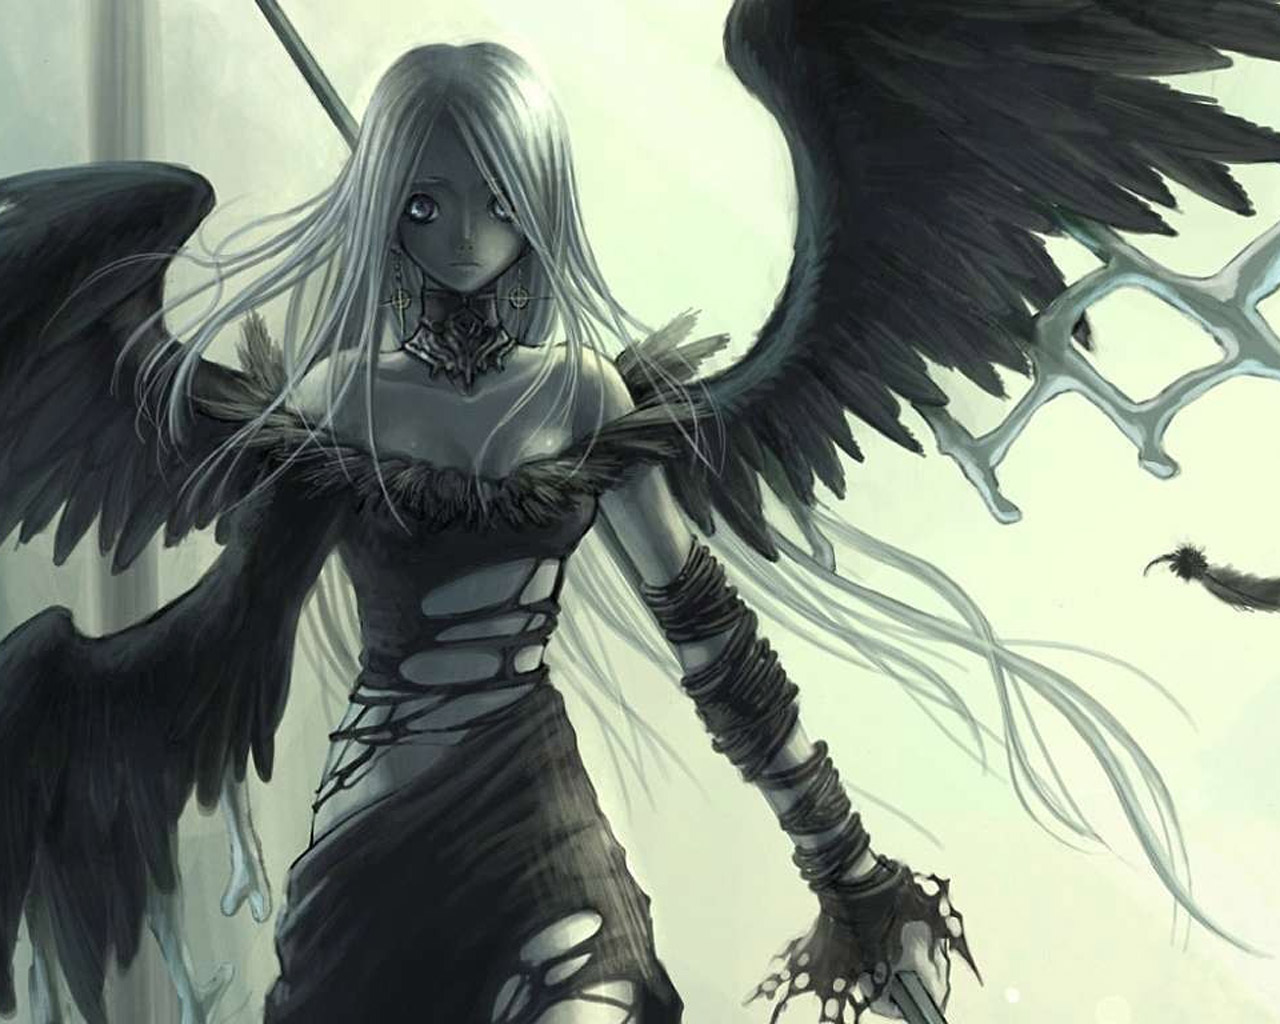 Dark wallpapers angels wallpapers - Dark anime girl pics ...